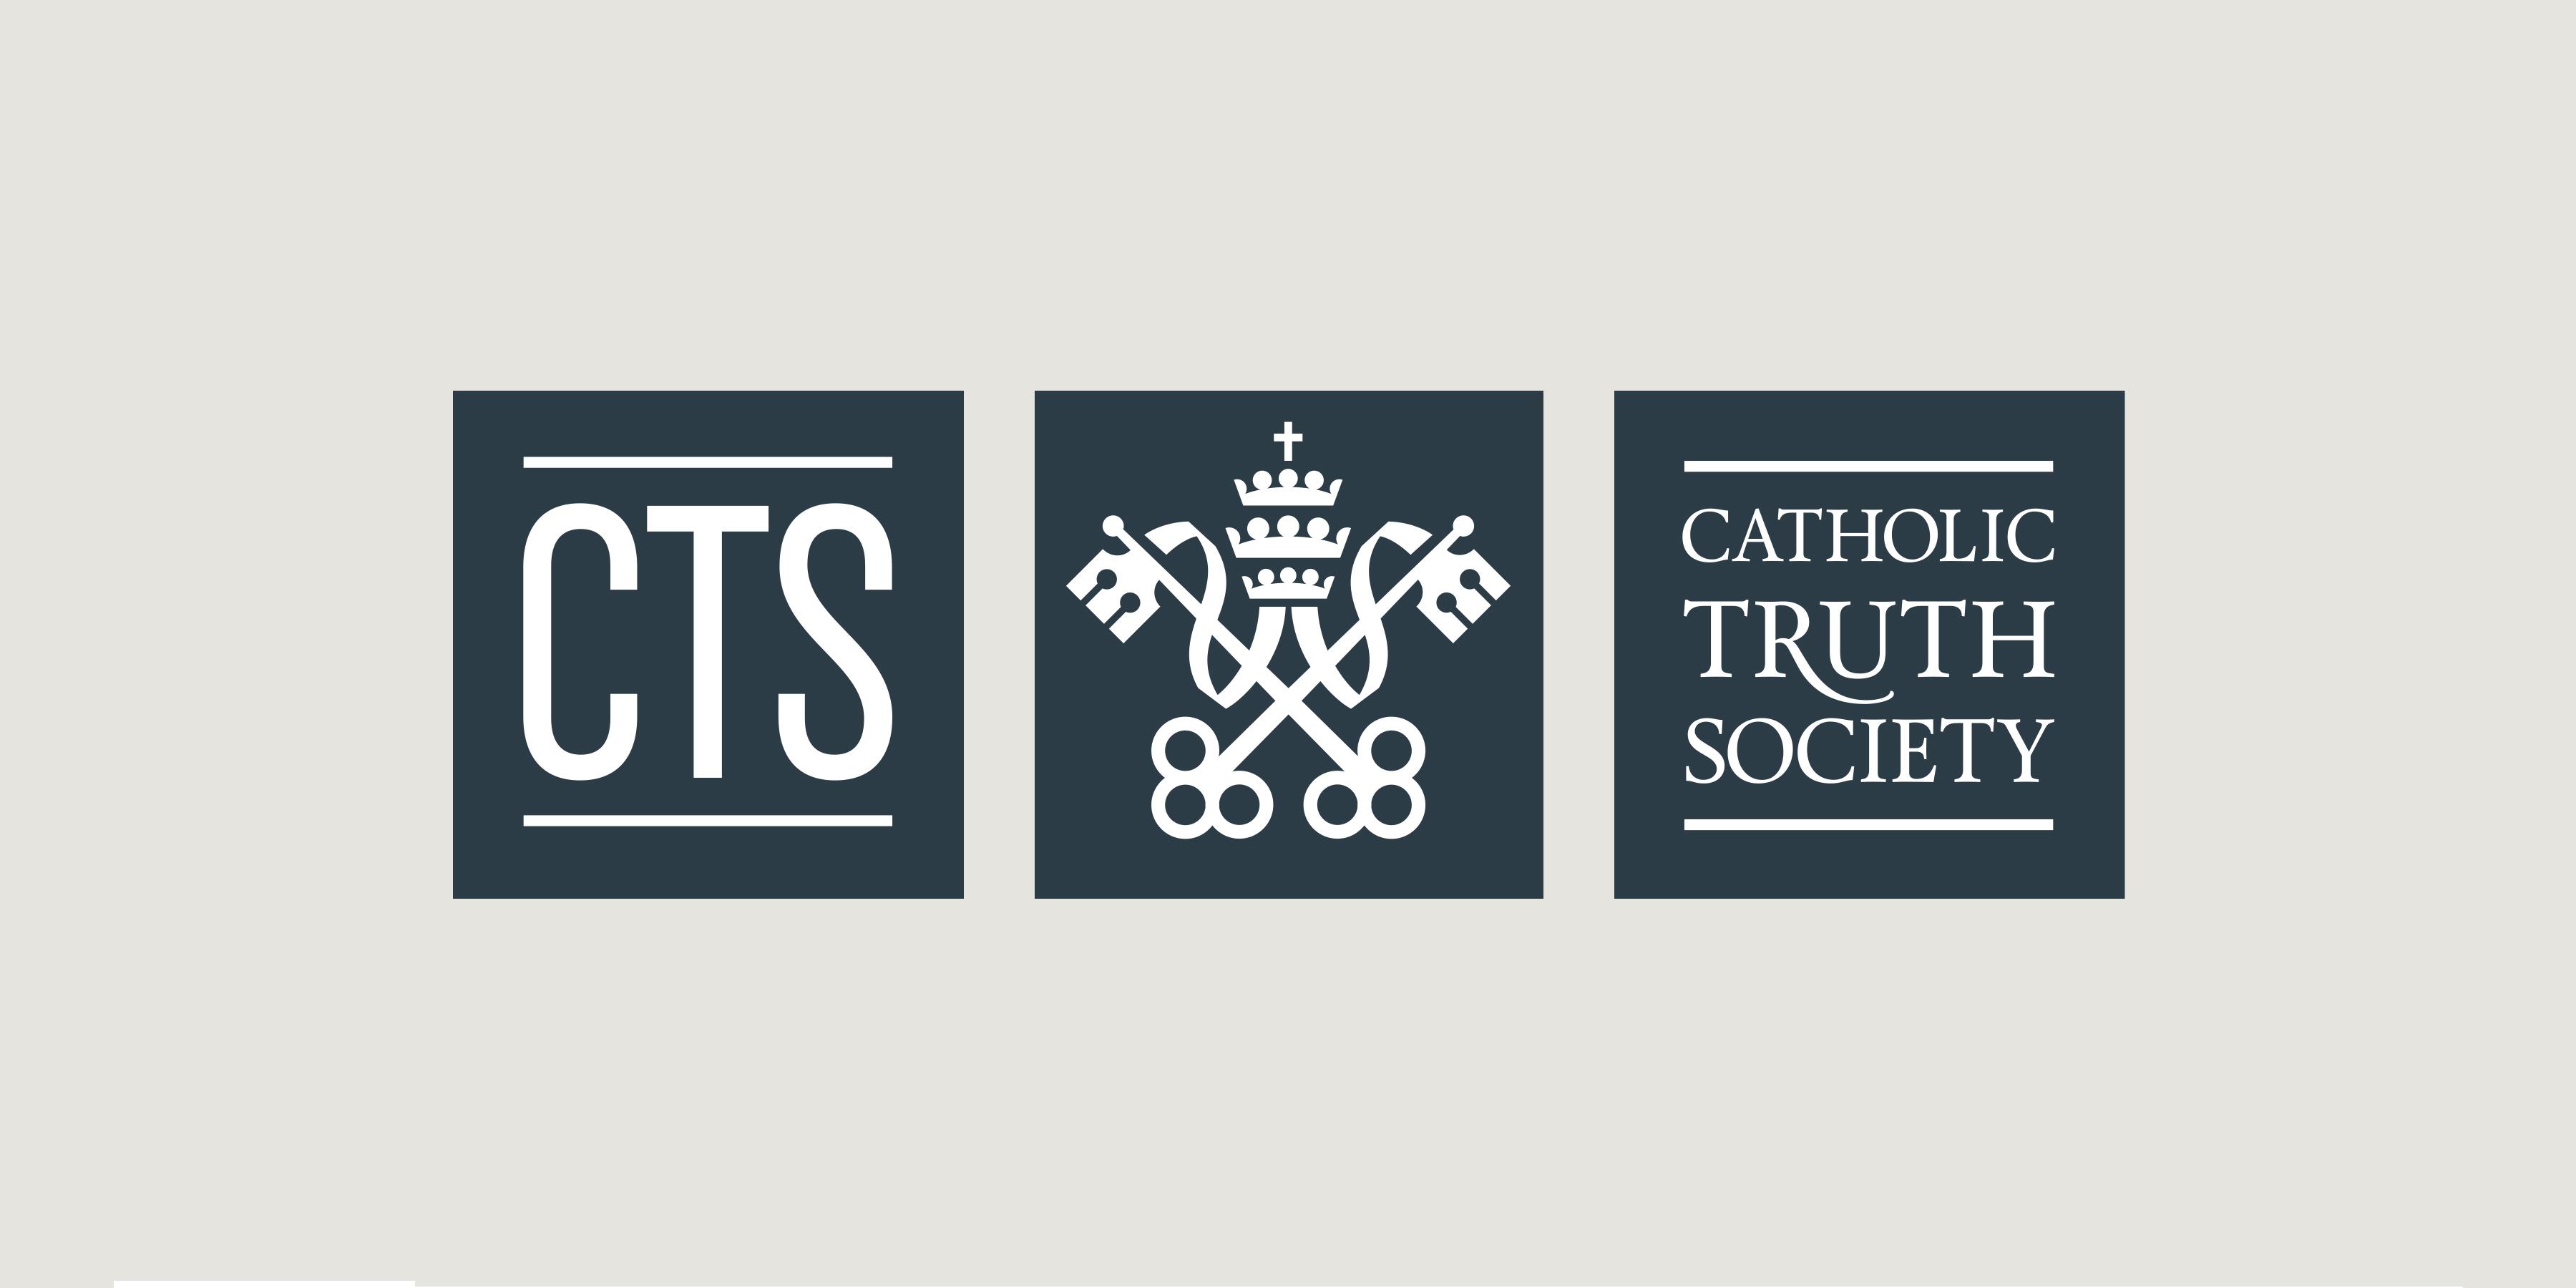 Catholic Truth Society logo